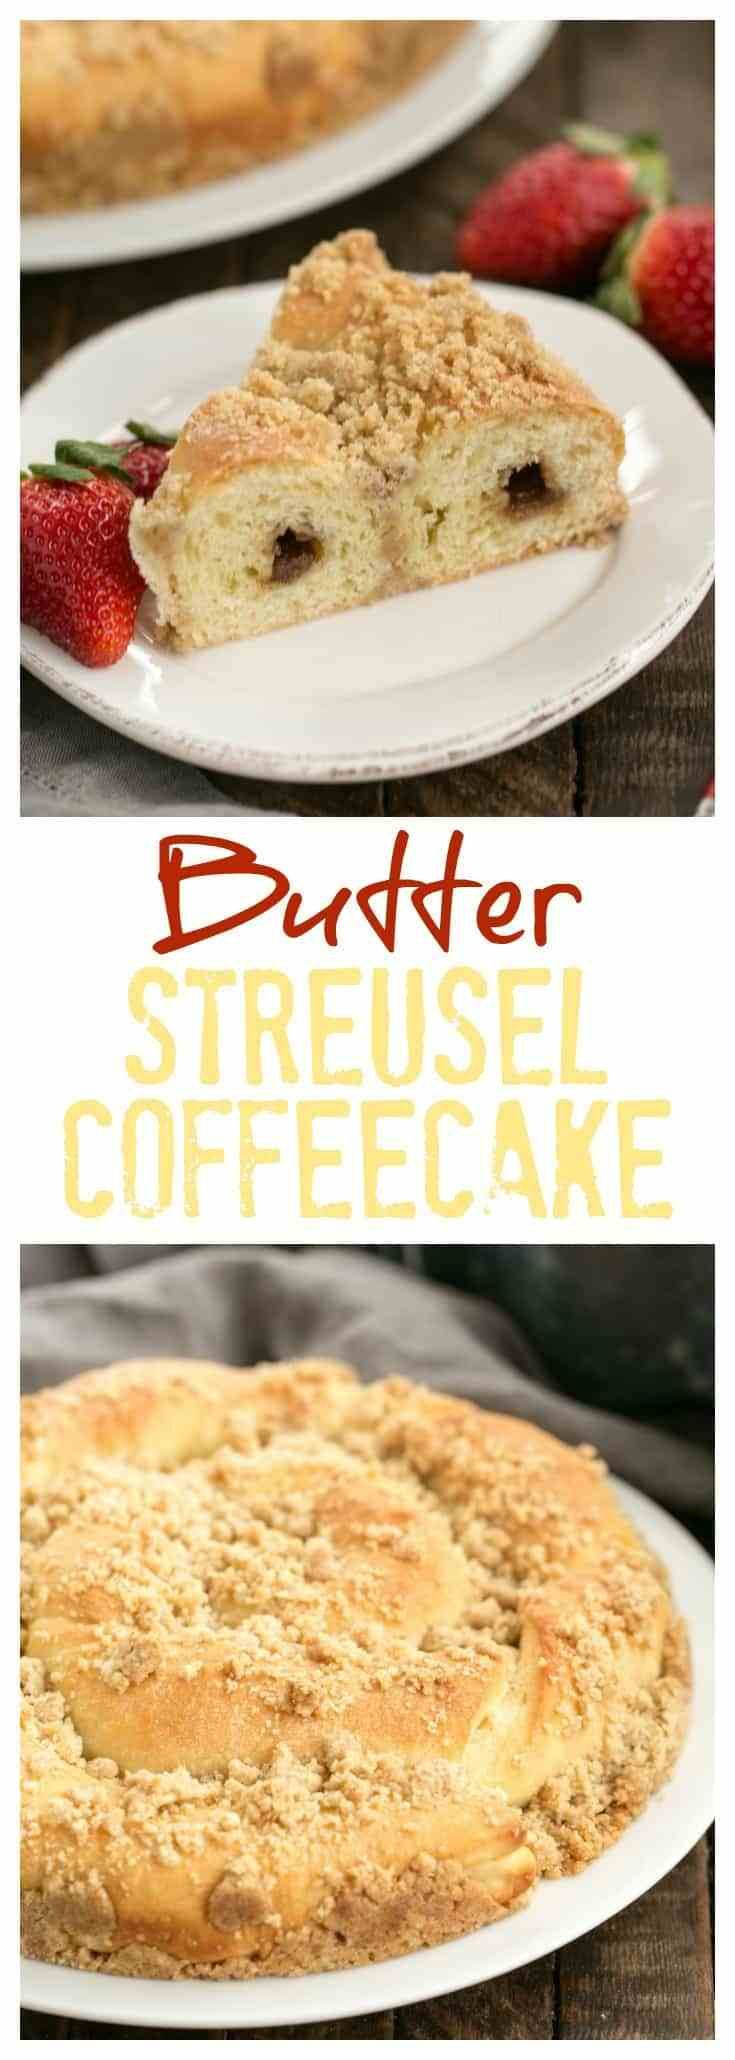 Copycat sara lee butter streusel coffeecake recipe